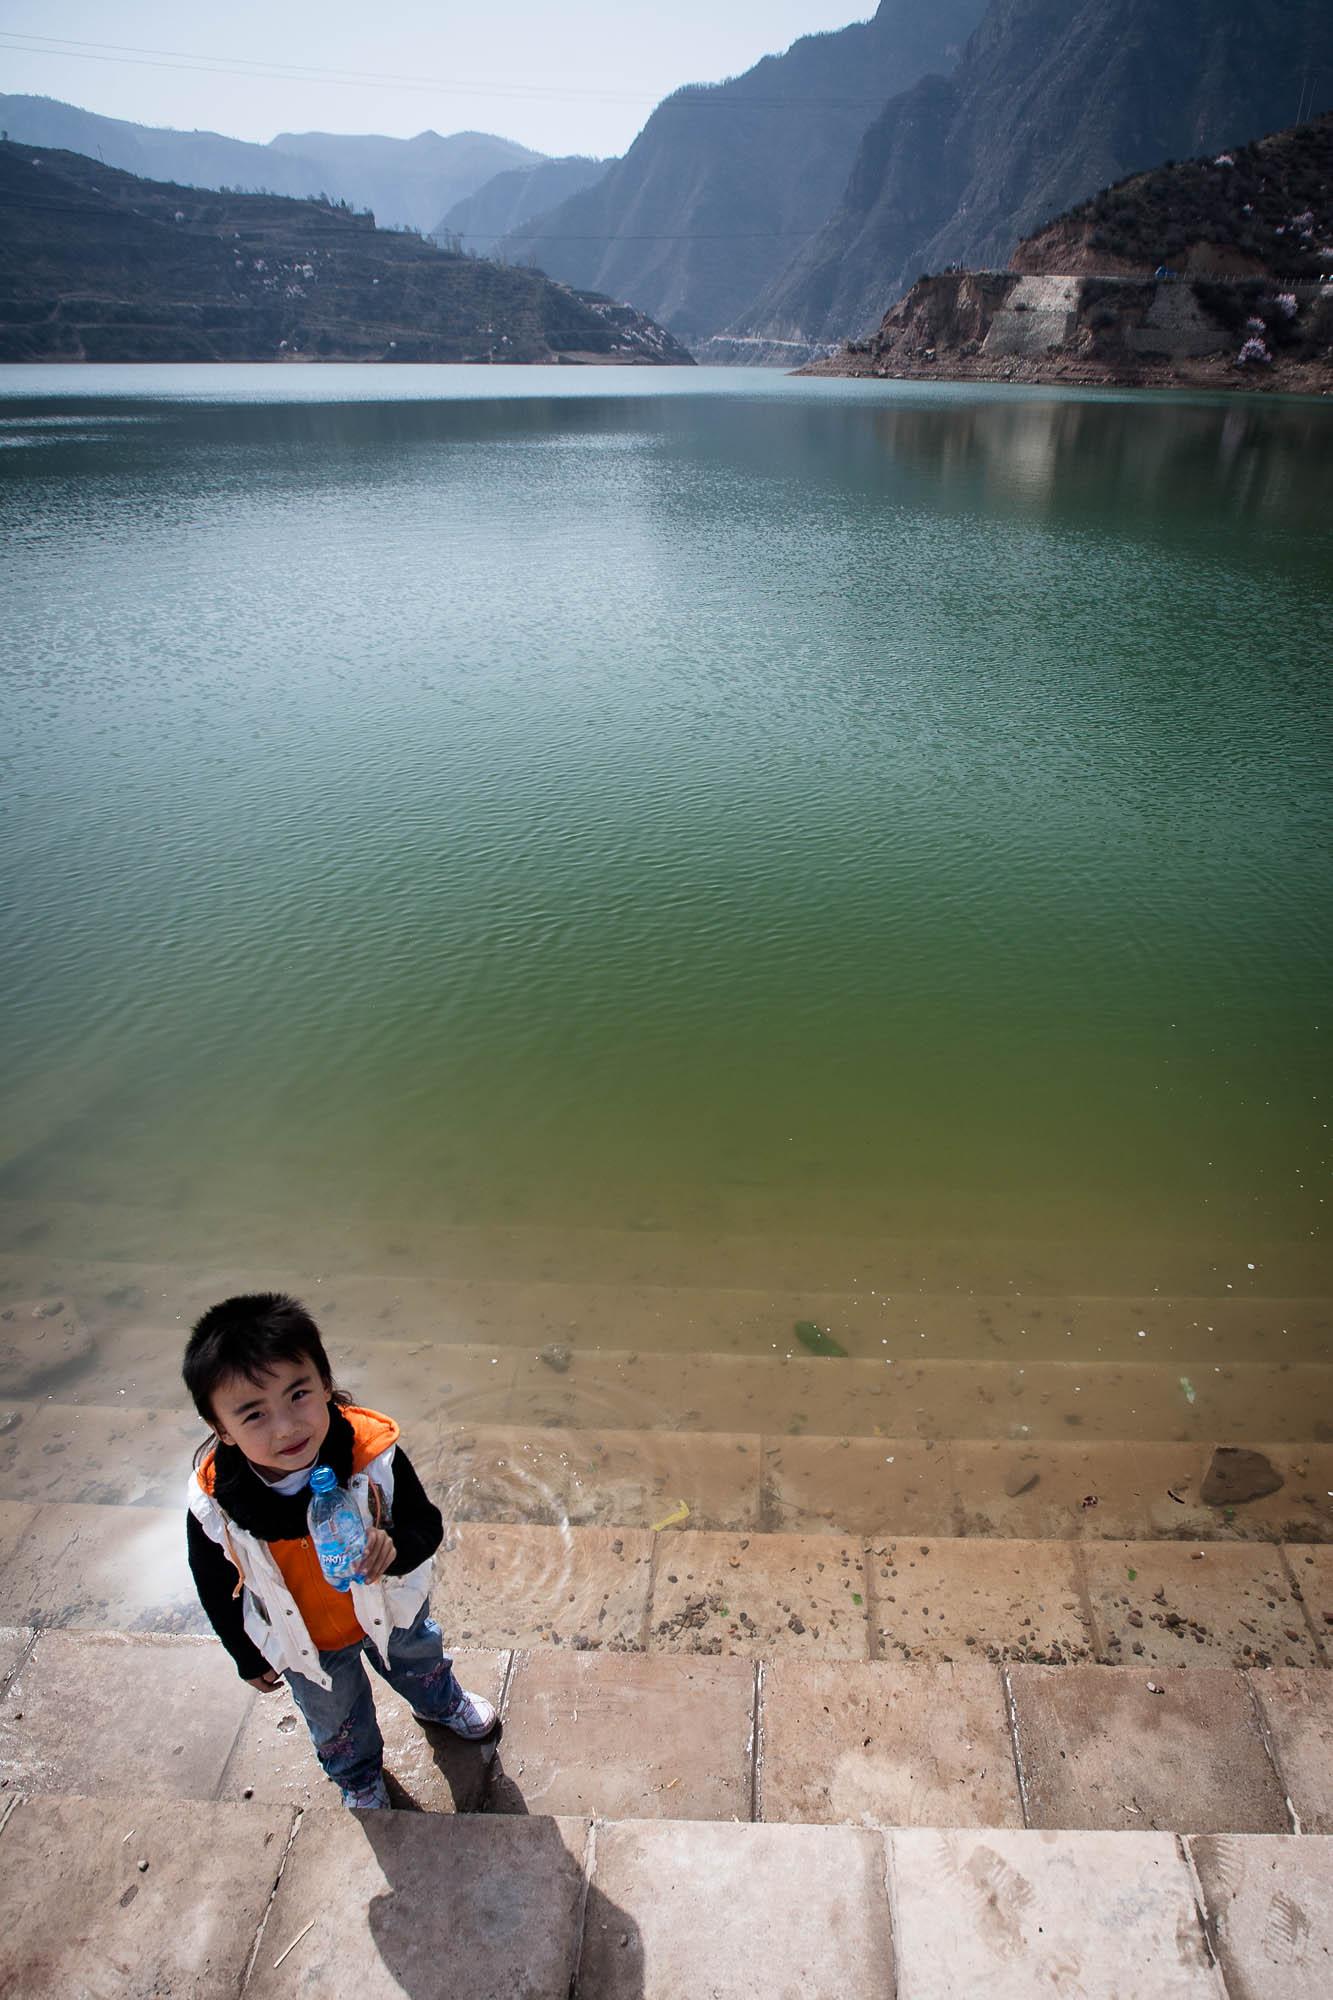 Keke at the reservoir